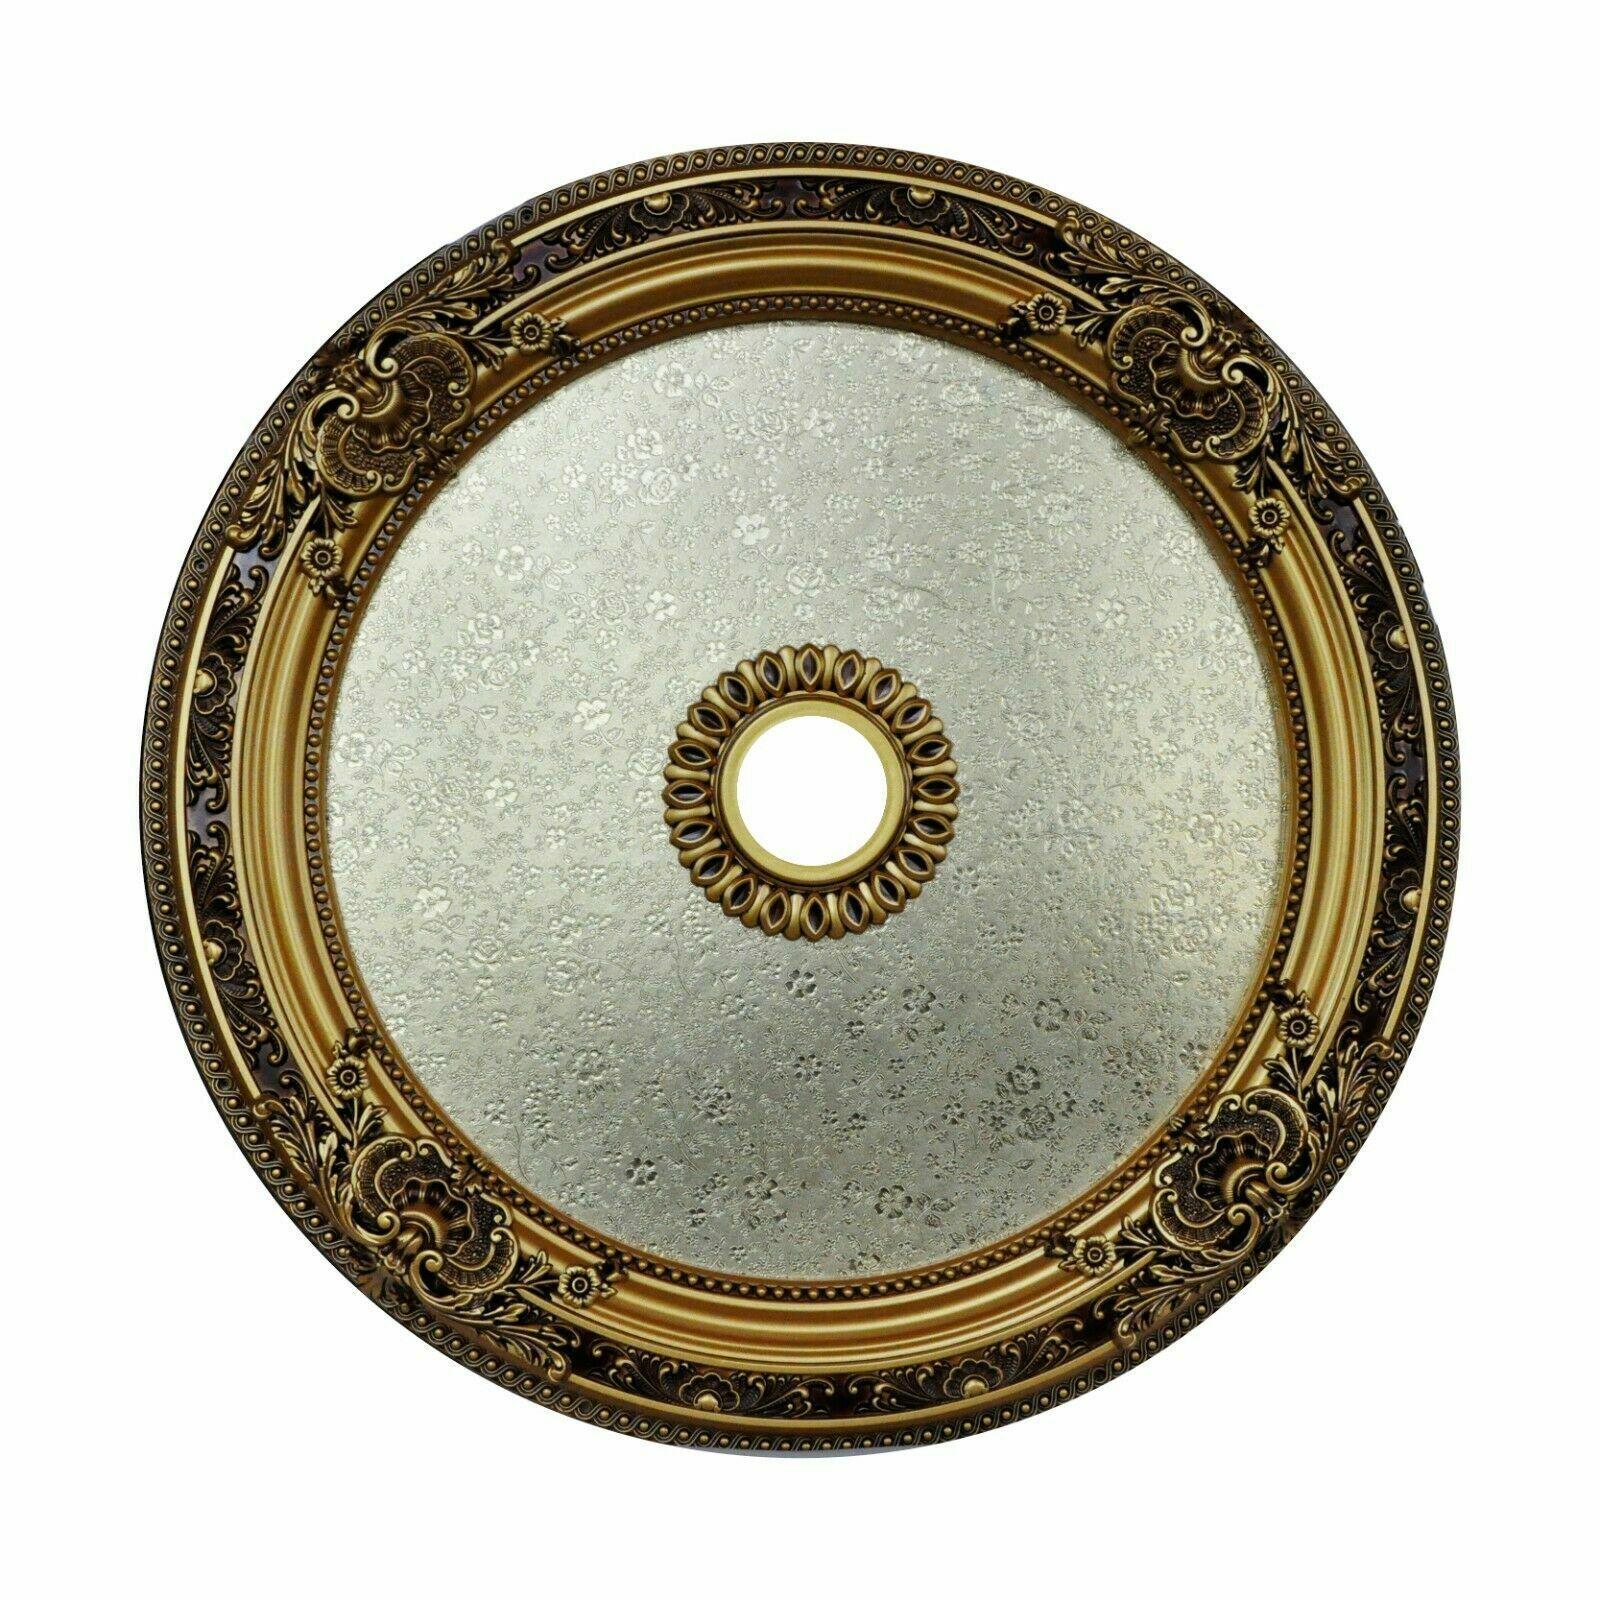 36 Round Chandelier Ceiling Medallion Gold Floral Foyer Dining Room Bedroom Ebay